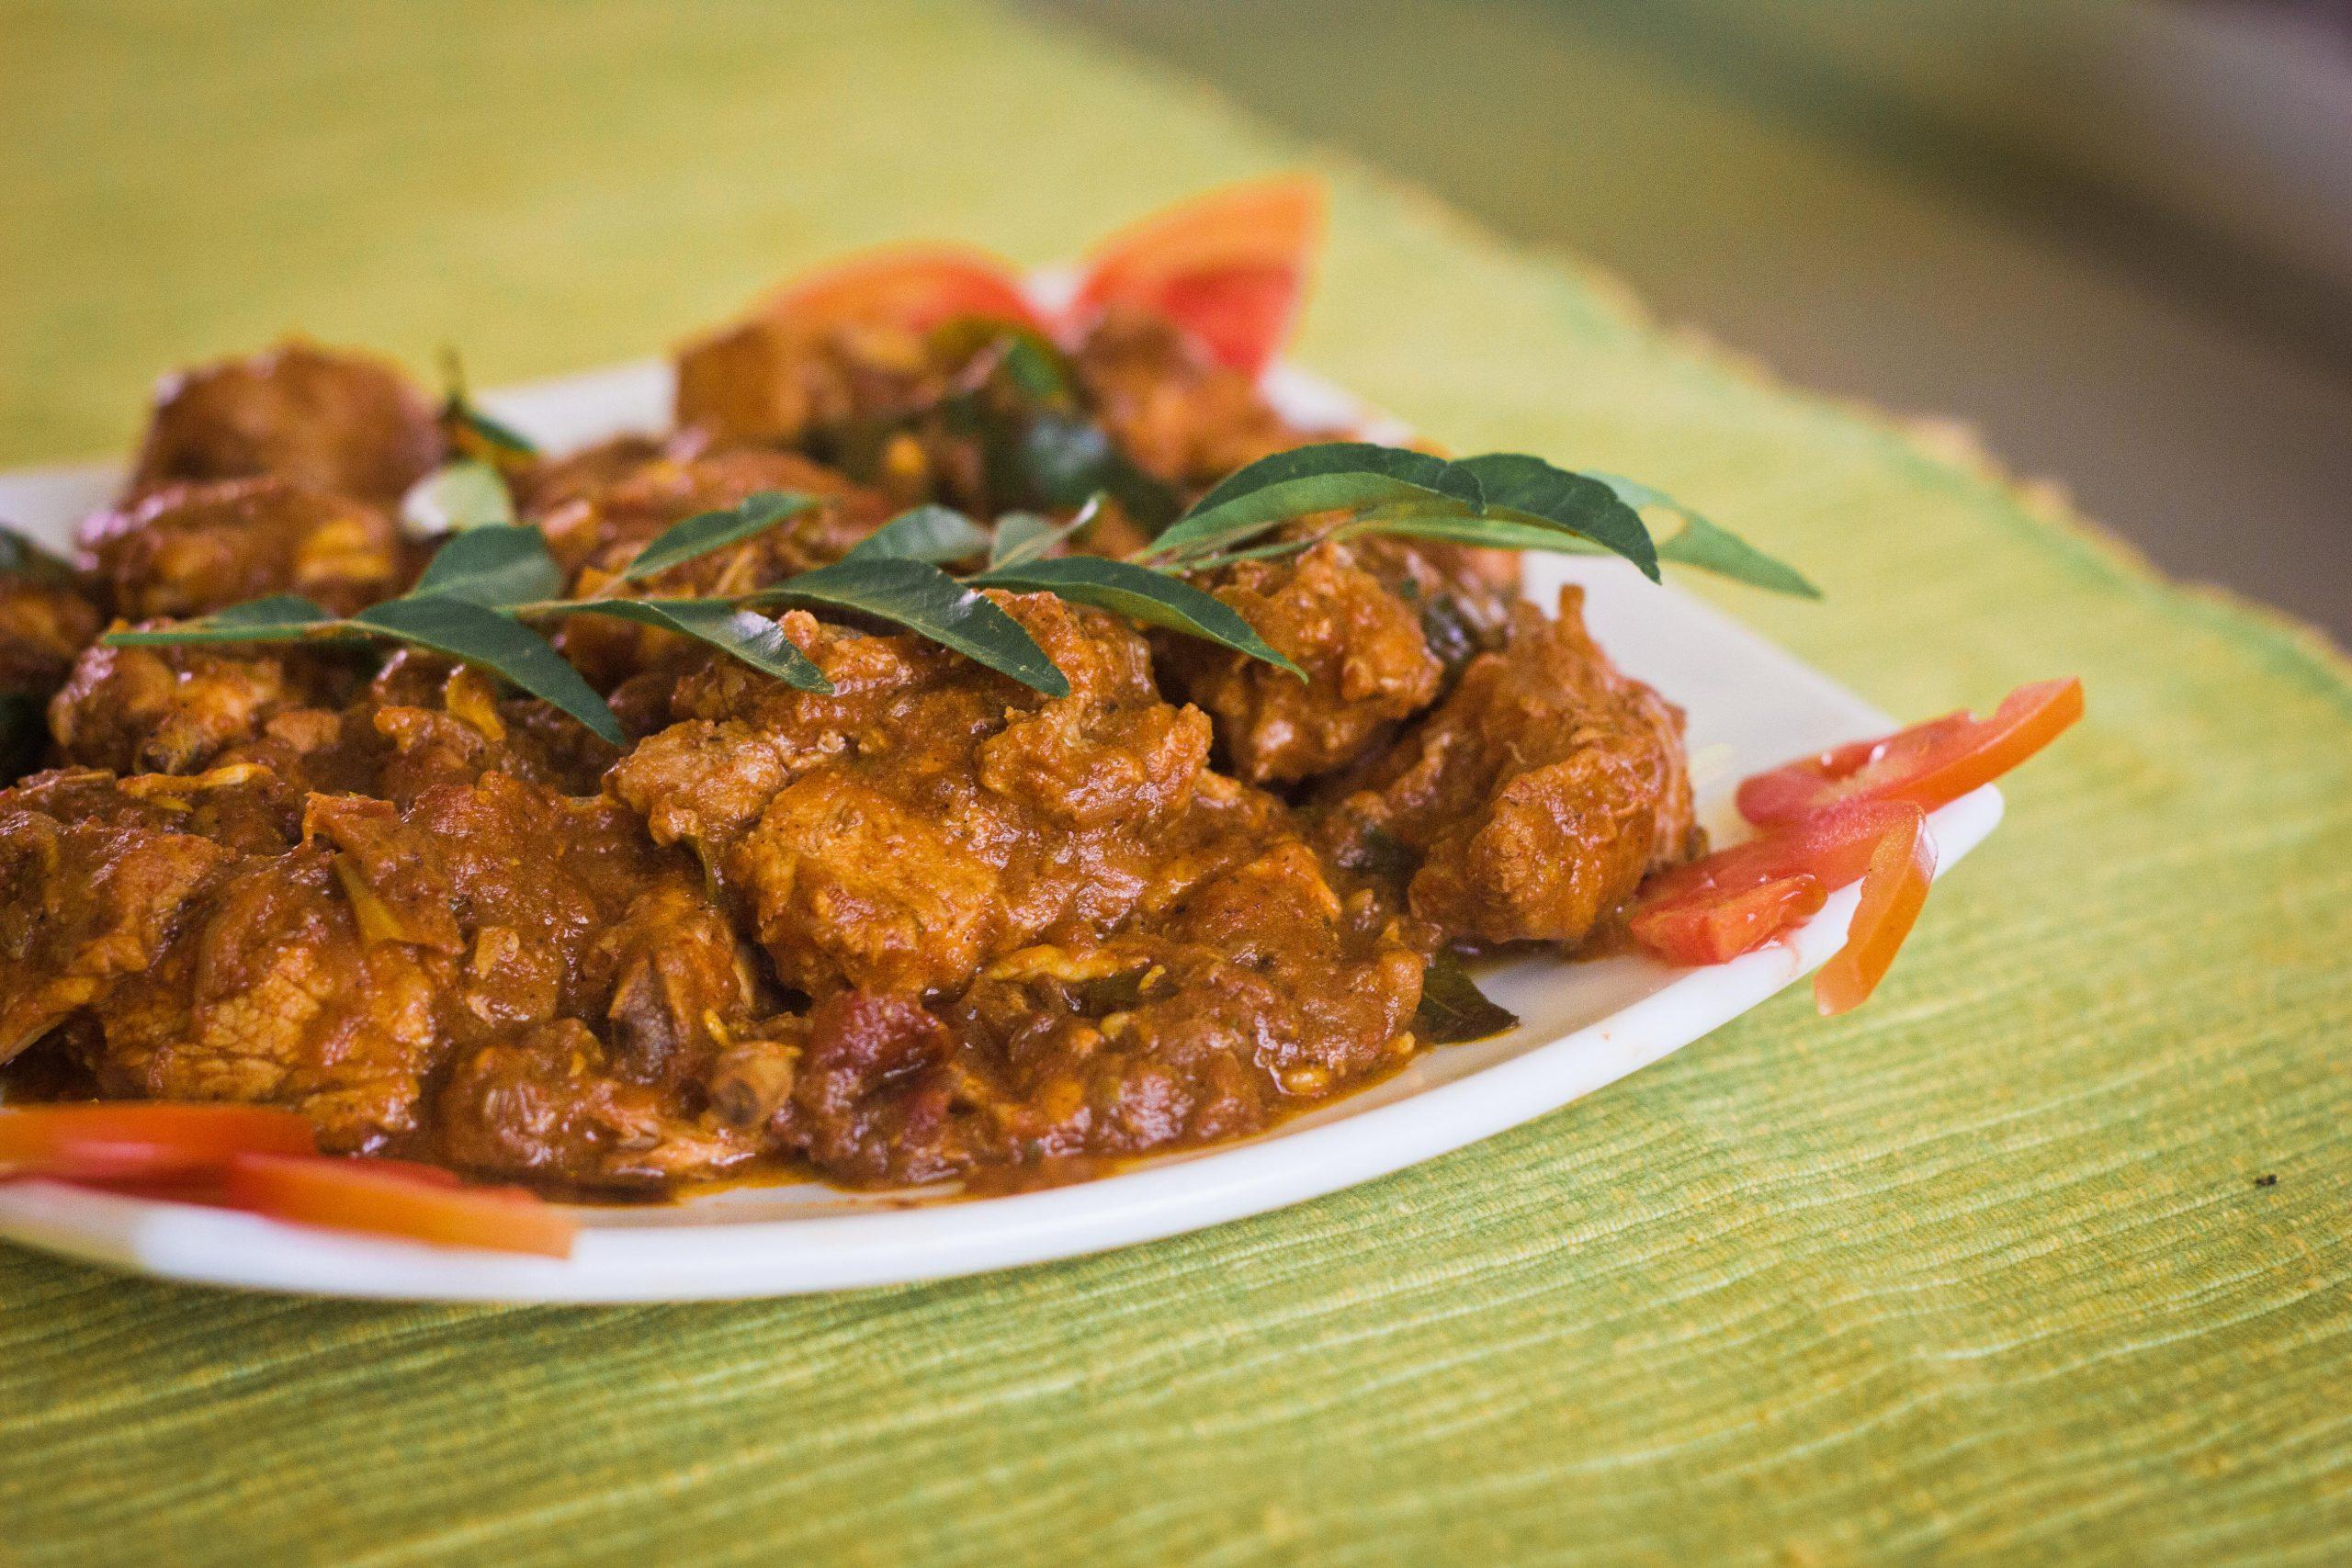 Nadan Kozhi Varuthathu - Famous Kerala Dishes to Try When In Kerala